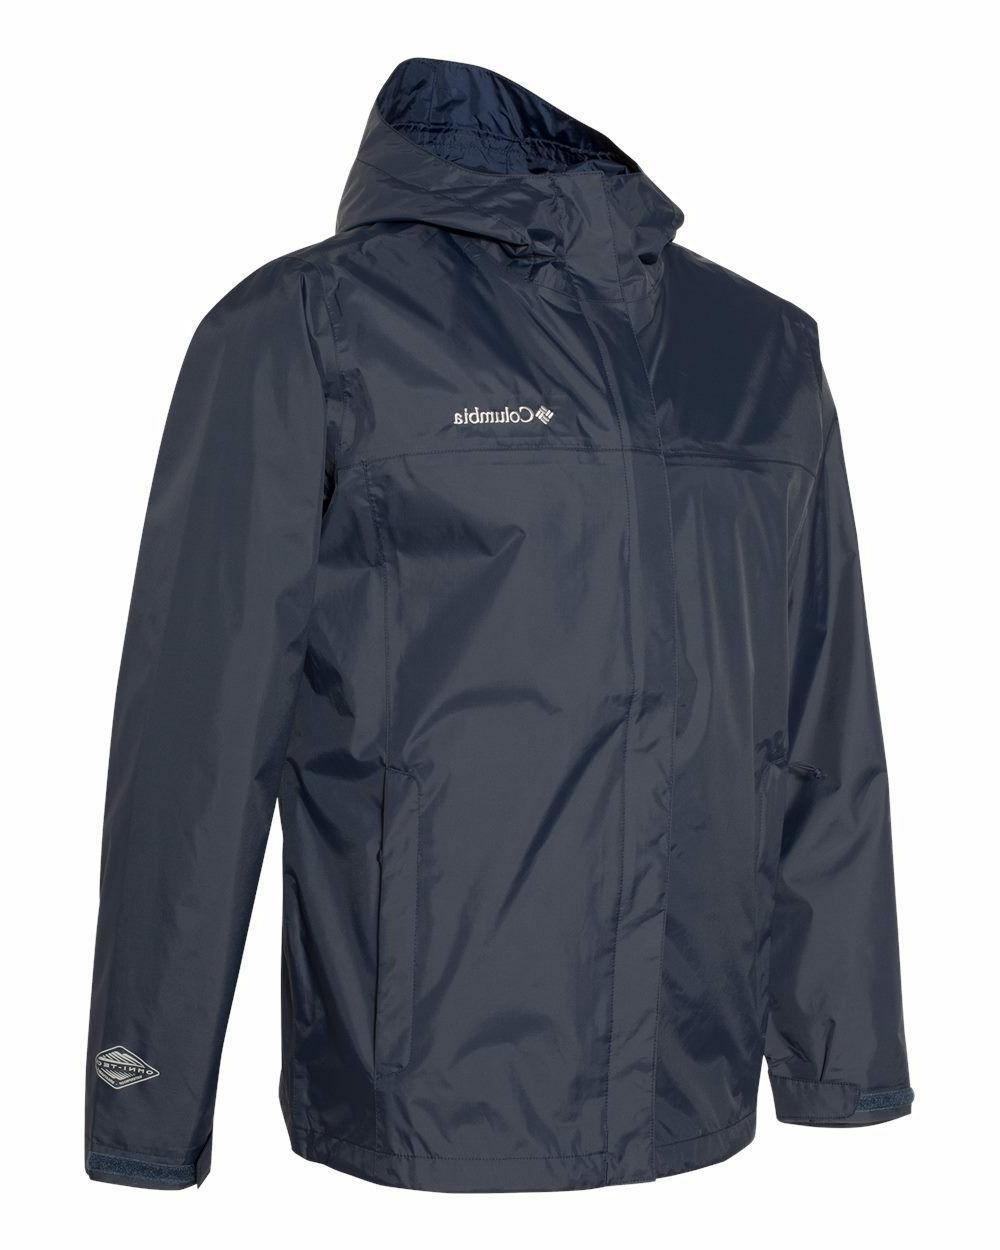 Columbia Waterproof, Breathable Rain NEW, Packable